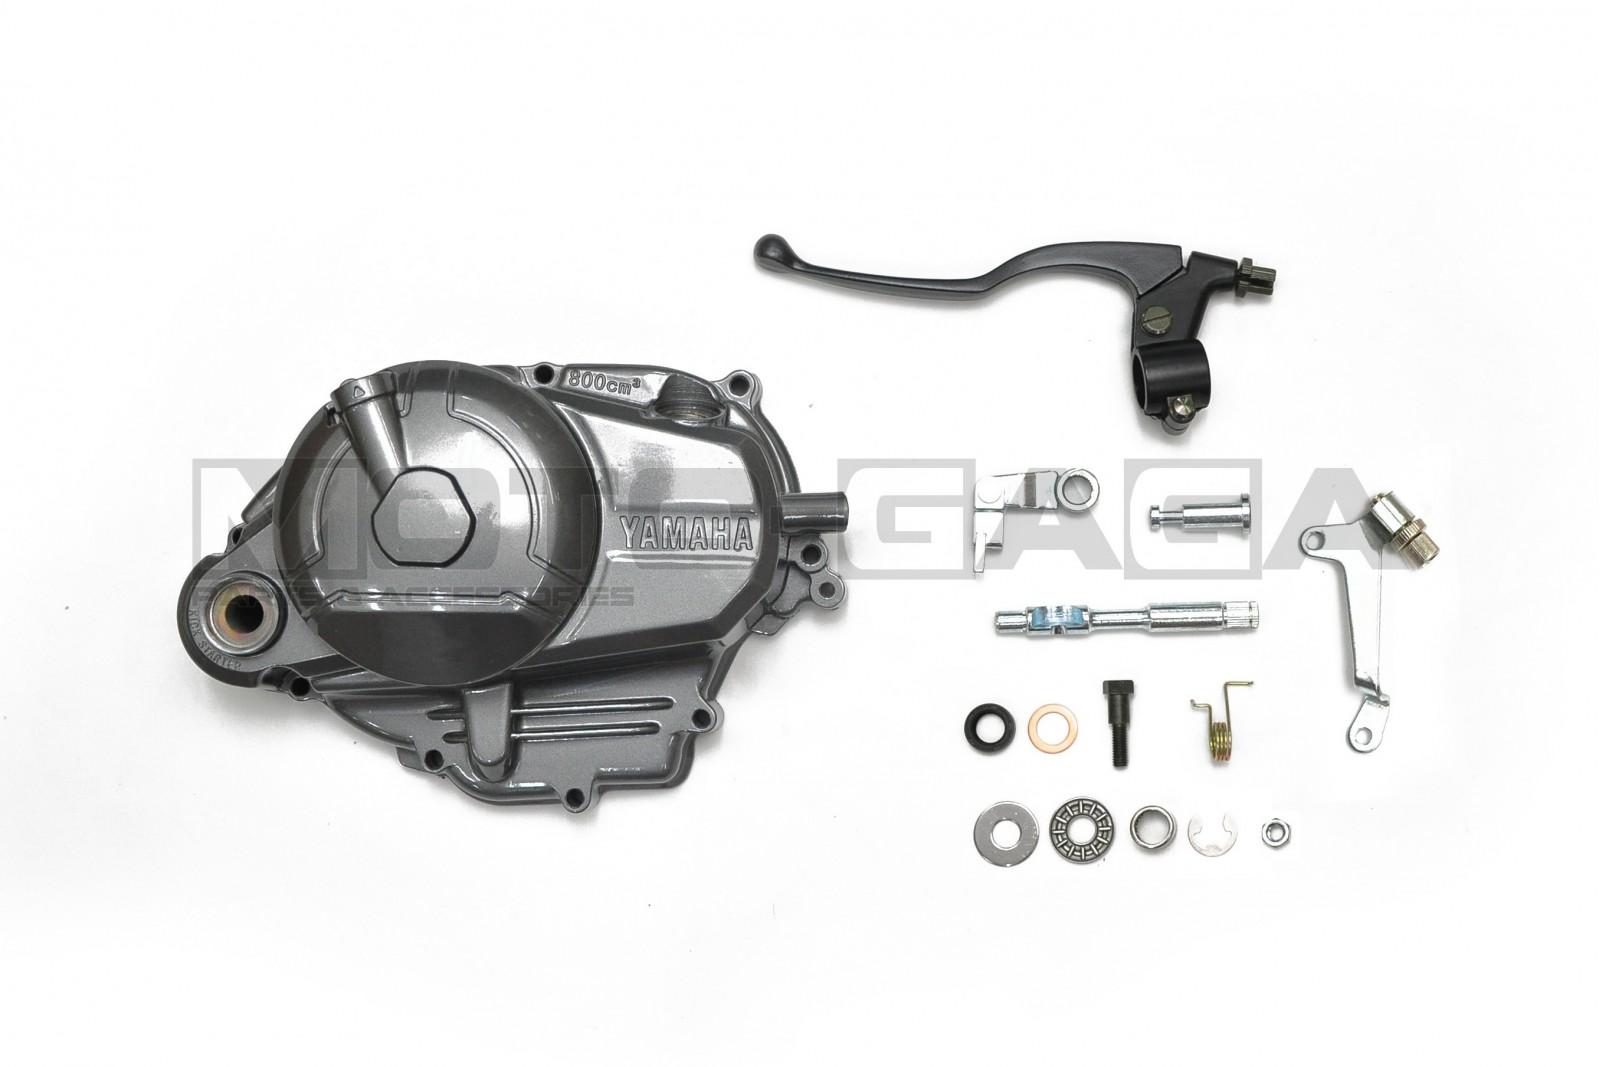 Yamaha Crypton/Jupiter/Vega T 110 Manual Hand Clutch